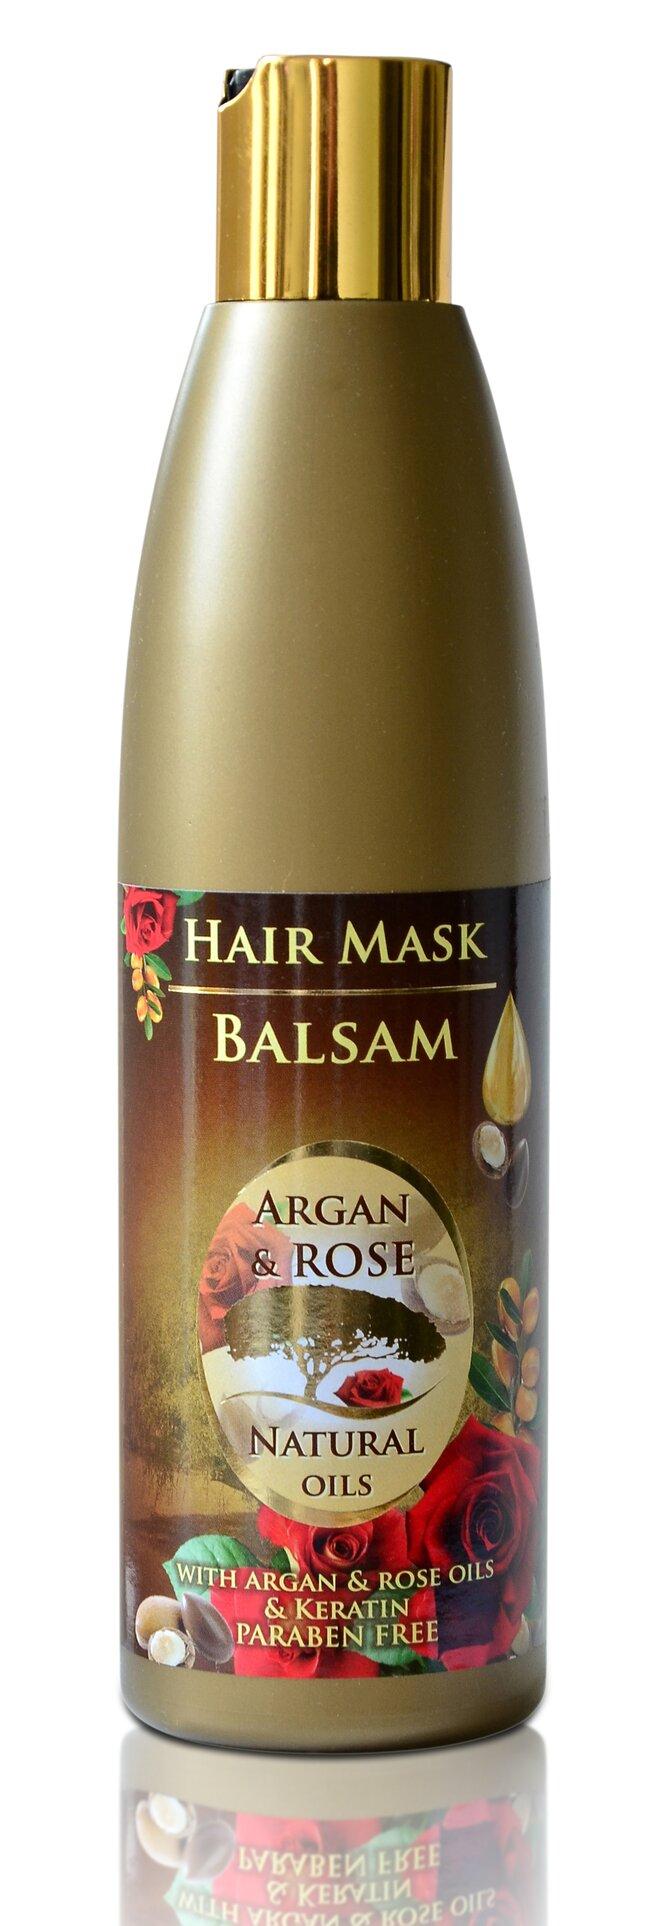 Balzám na vlasy Argan & Rose Natural Oils, 250 ml